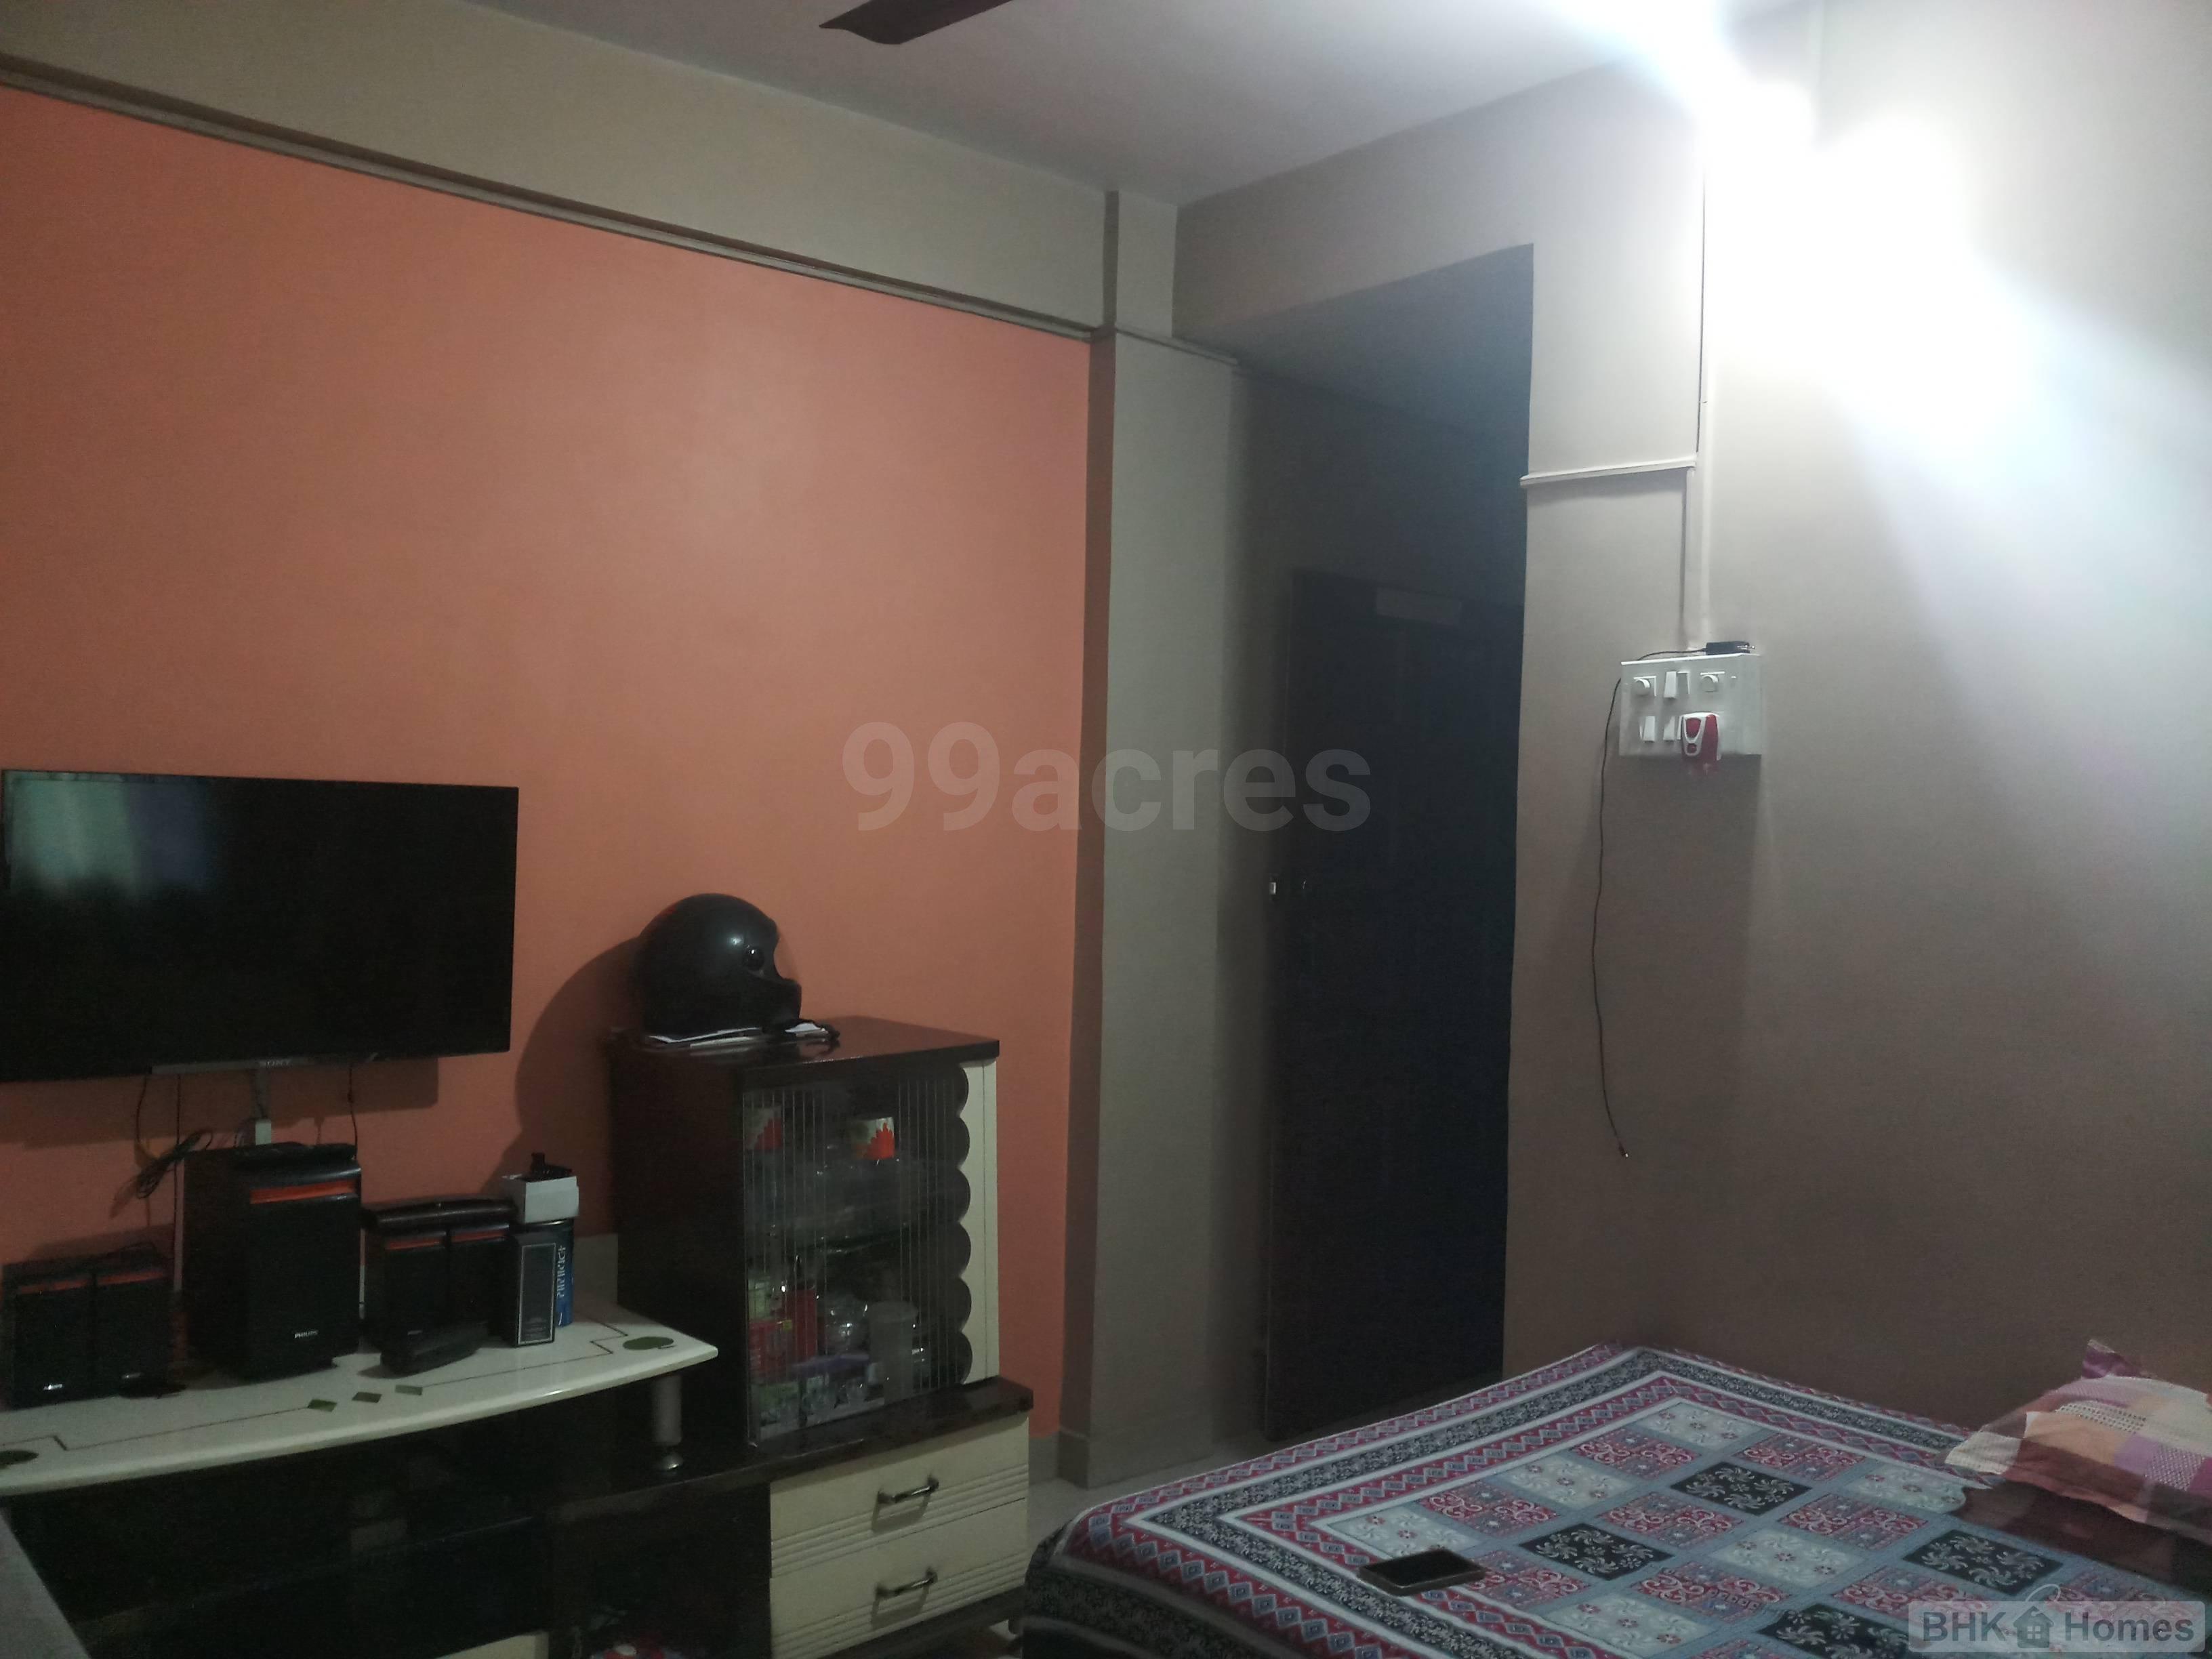 1 BHK  Apartment for Sale in  Manpada